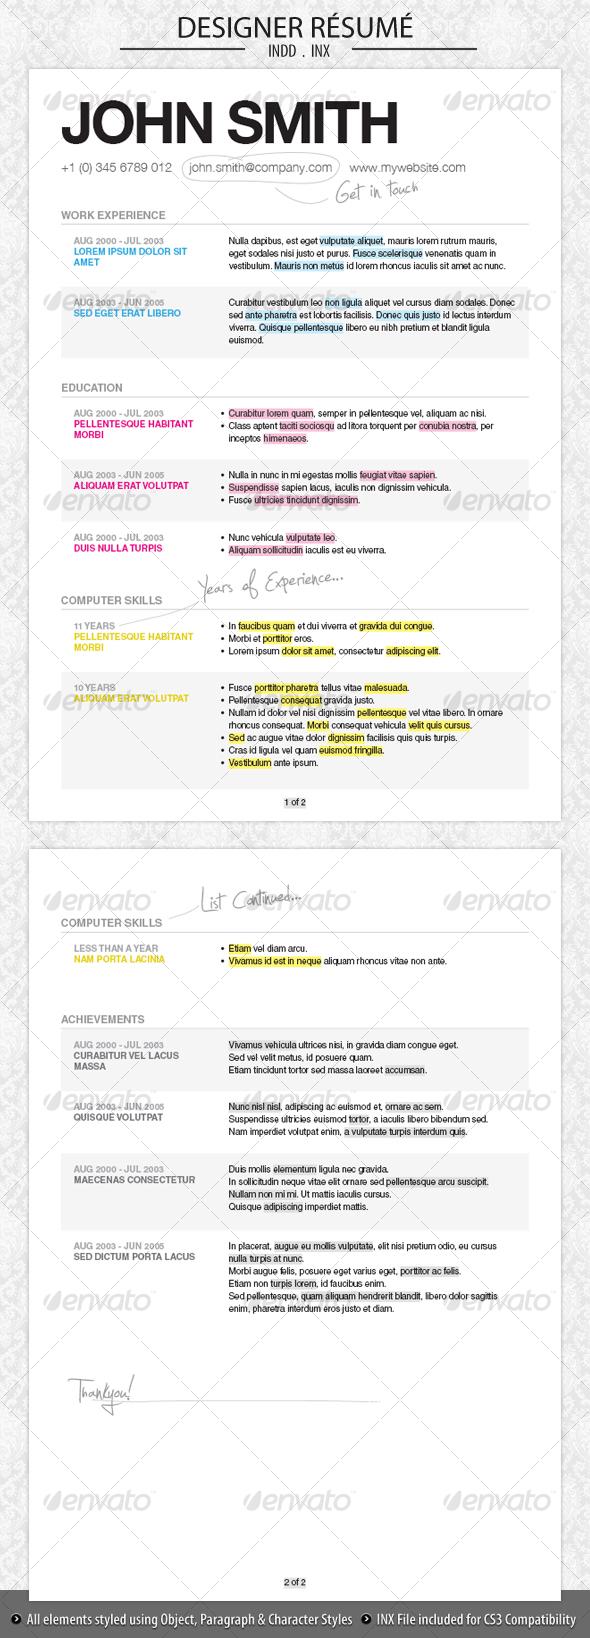 Instructional designer resume example